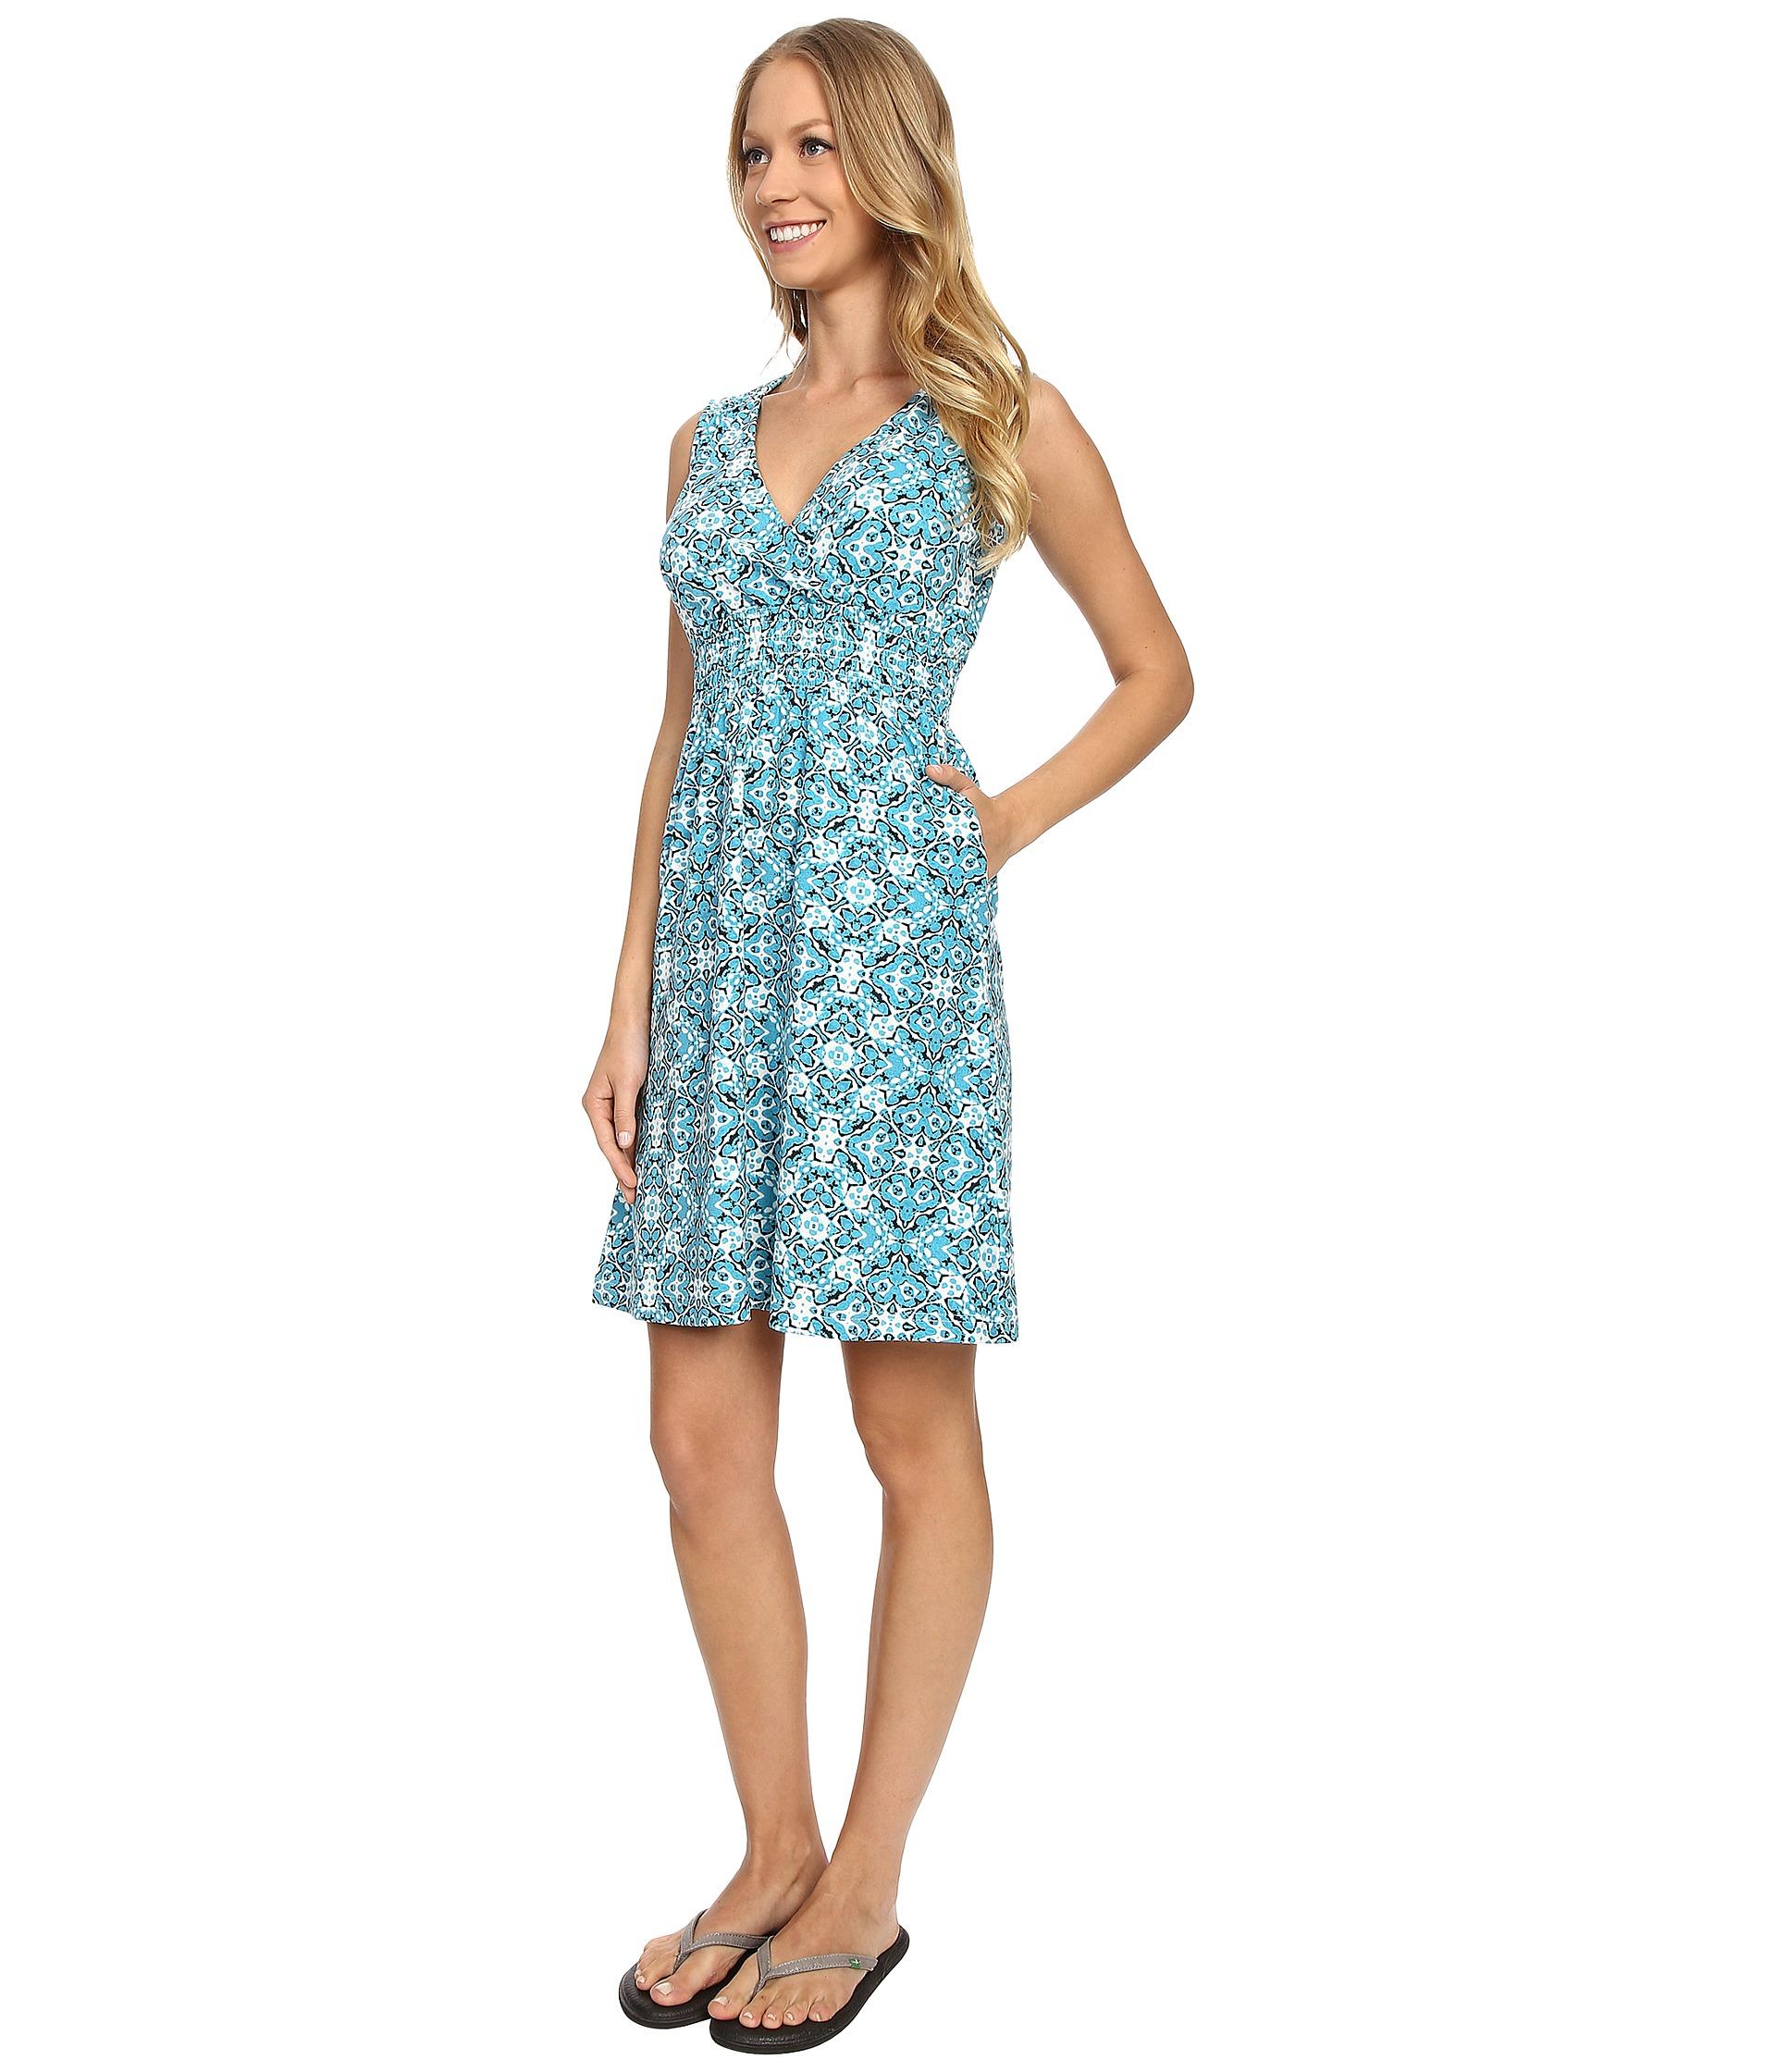 Lyst - Aventura Clothing Talisa Dress in Blue